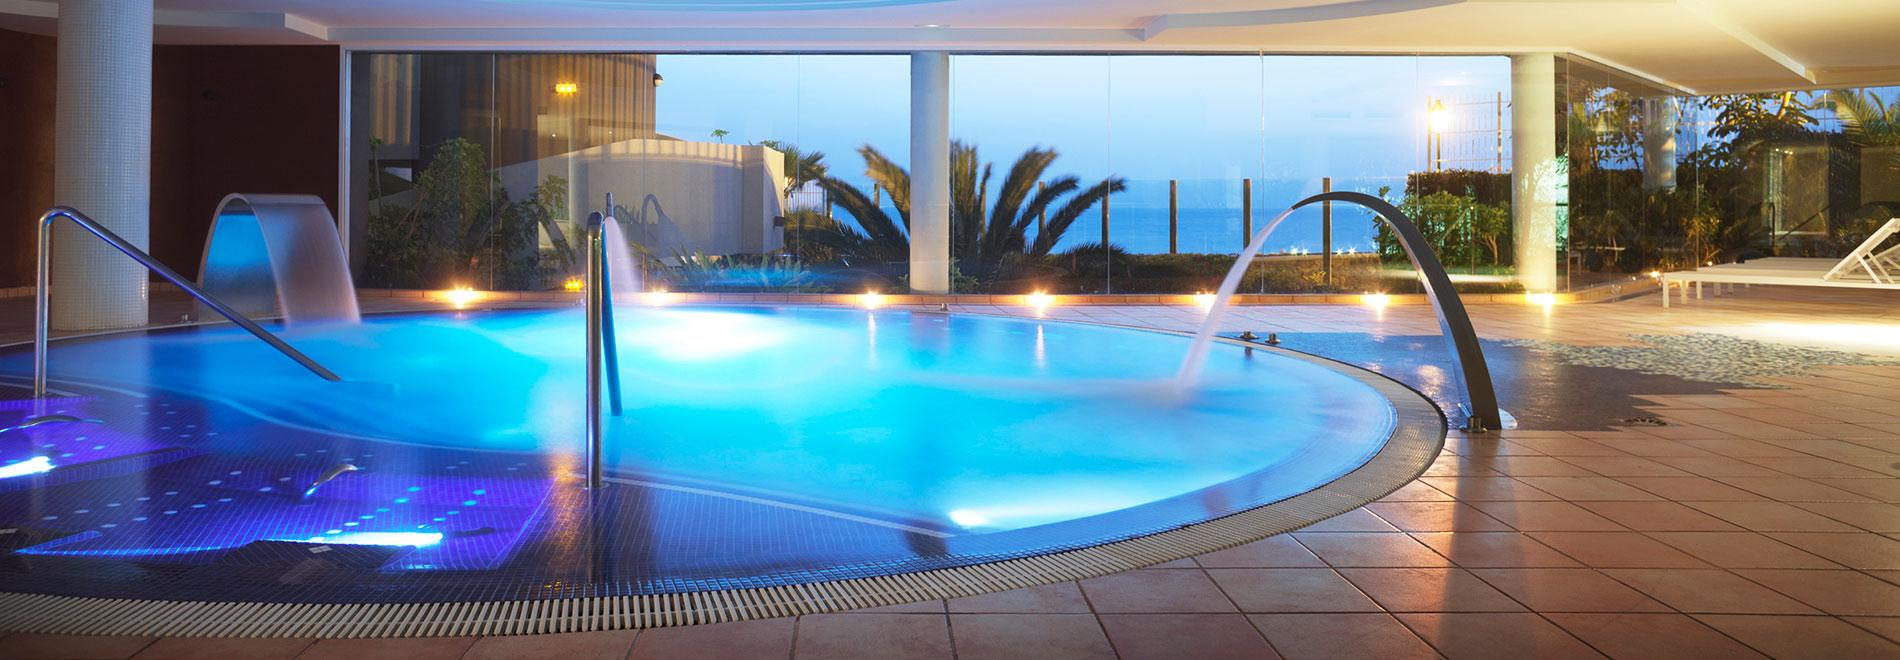 Angebote Adrian Hoteles Teneriffa Offizielle Website